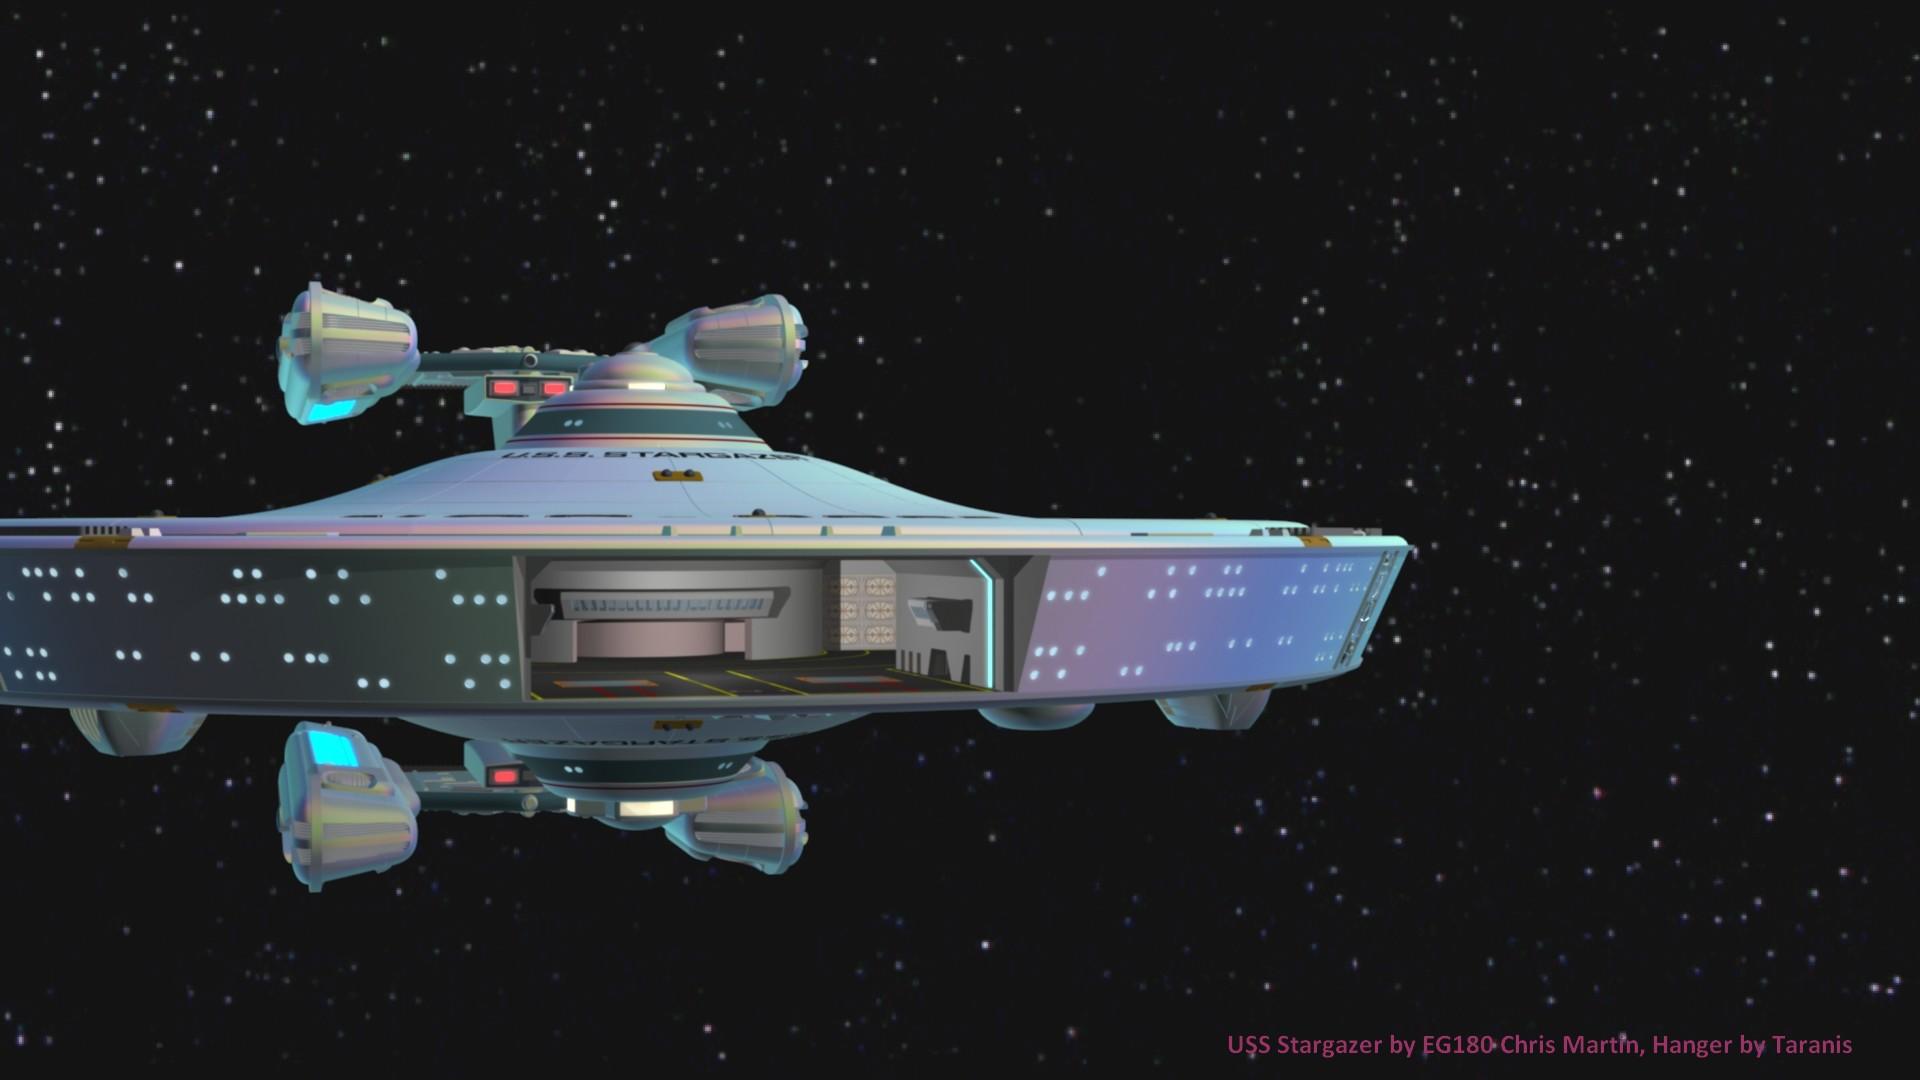 Star Trek Romulan Cgi Set Gmd3d S Designs,Simple Wedding Cupcake Designs